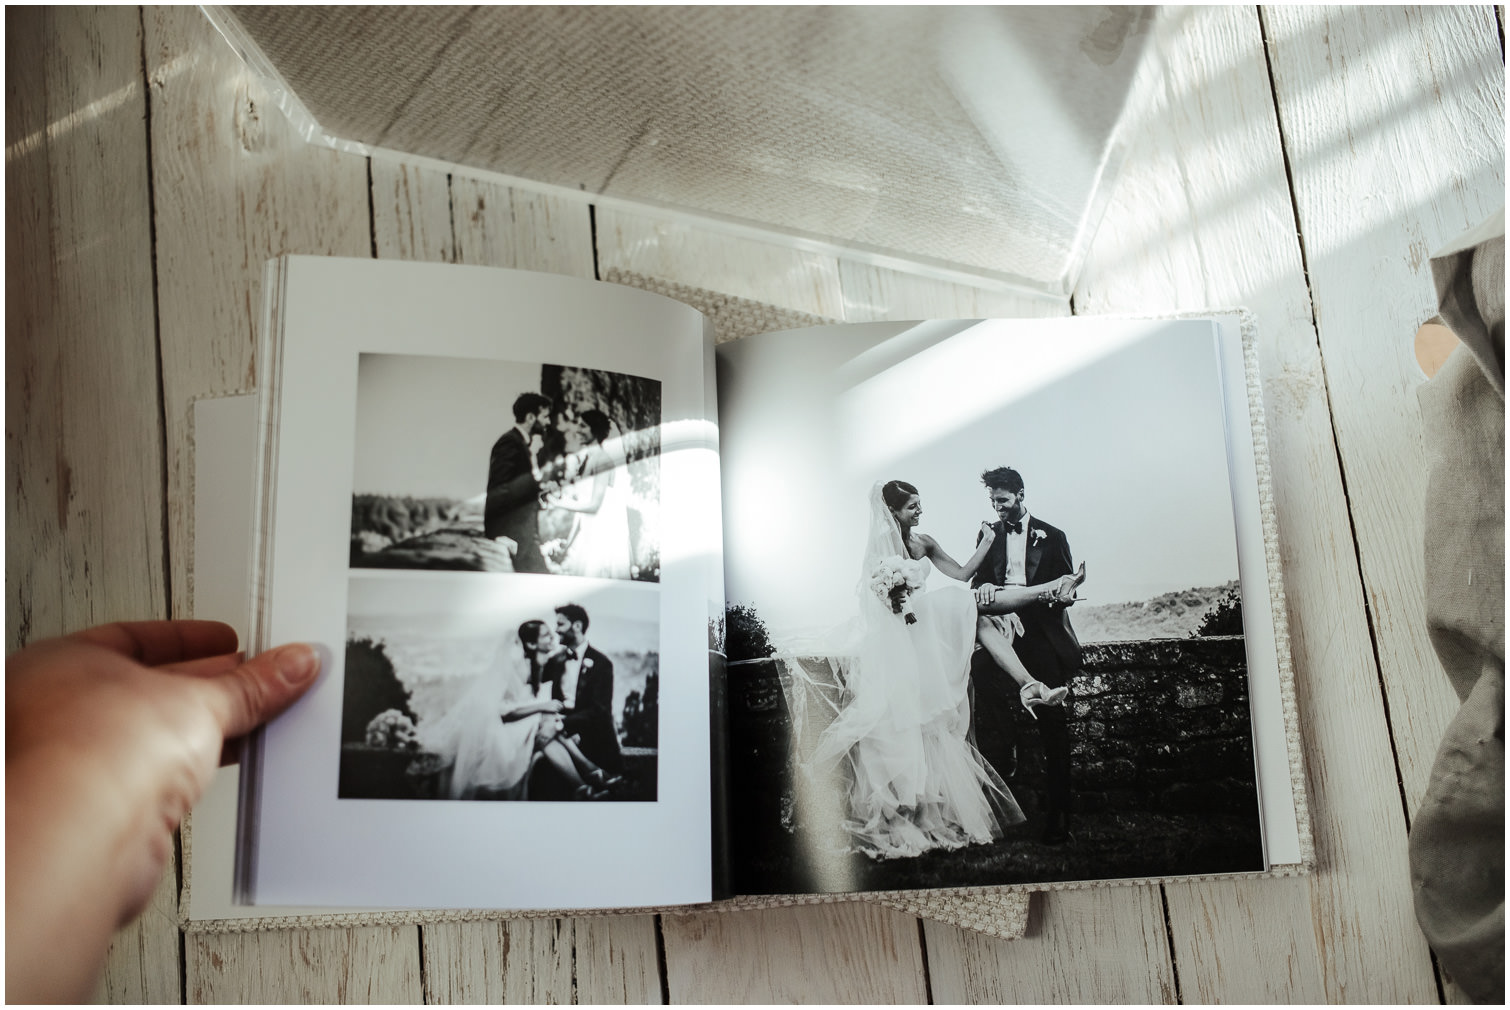 SARA-LORENZONI-FOTOGRAFIA-LETIZIA-MICHELE-JEWEL-BOOK-11